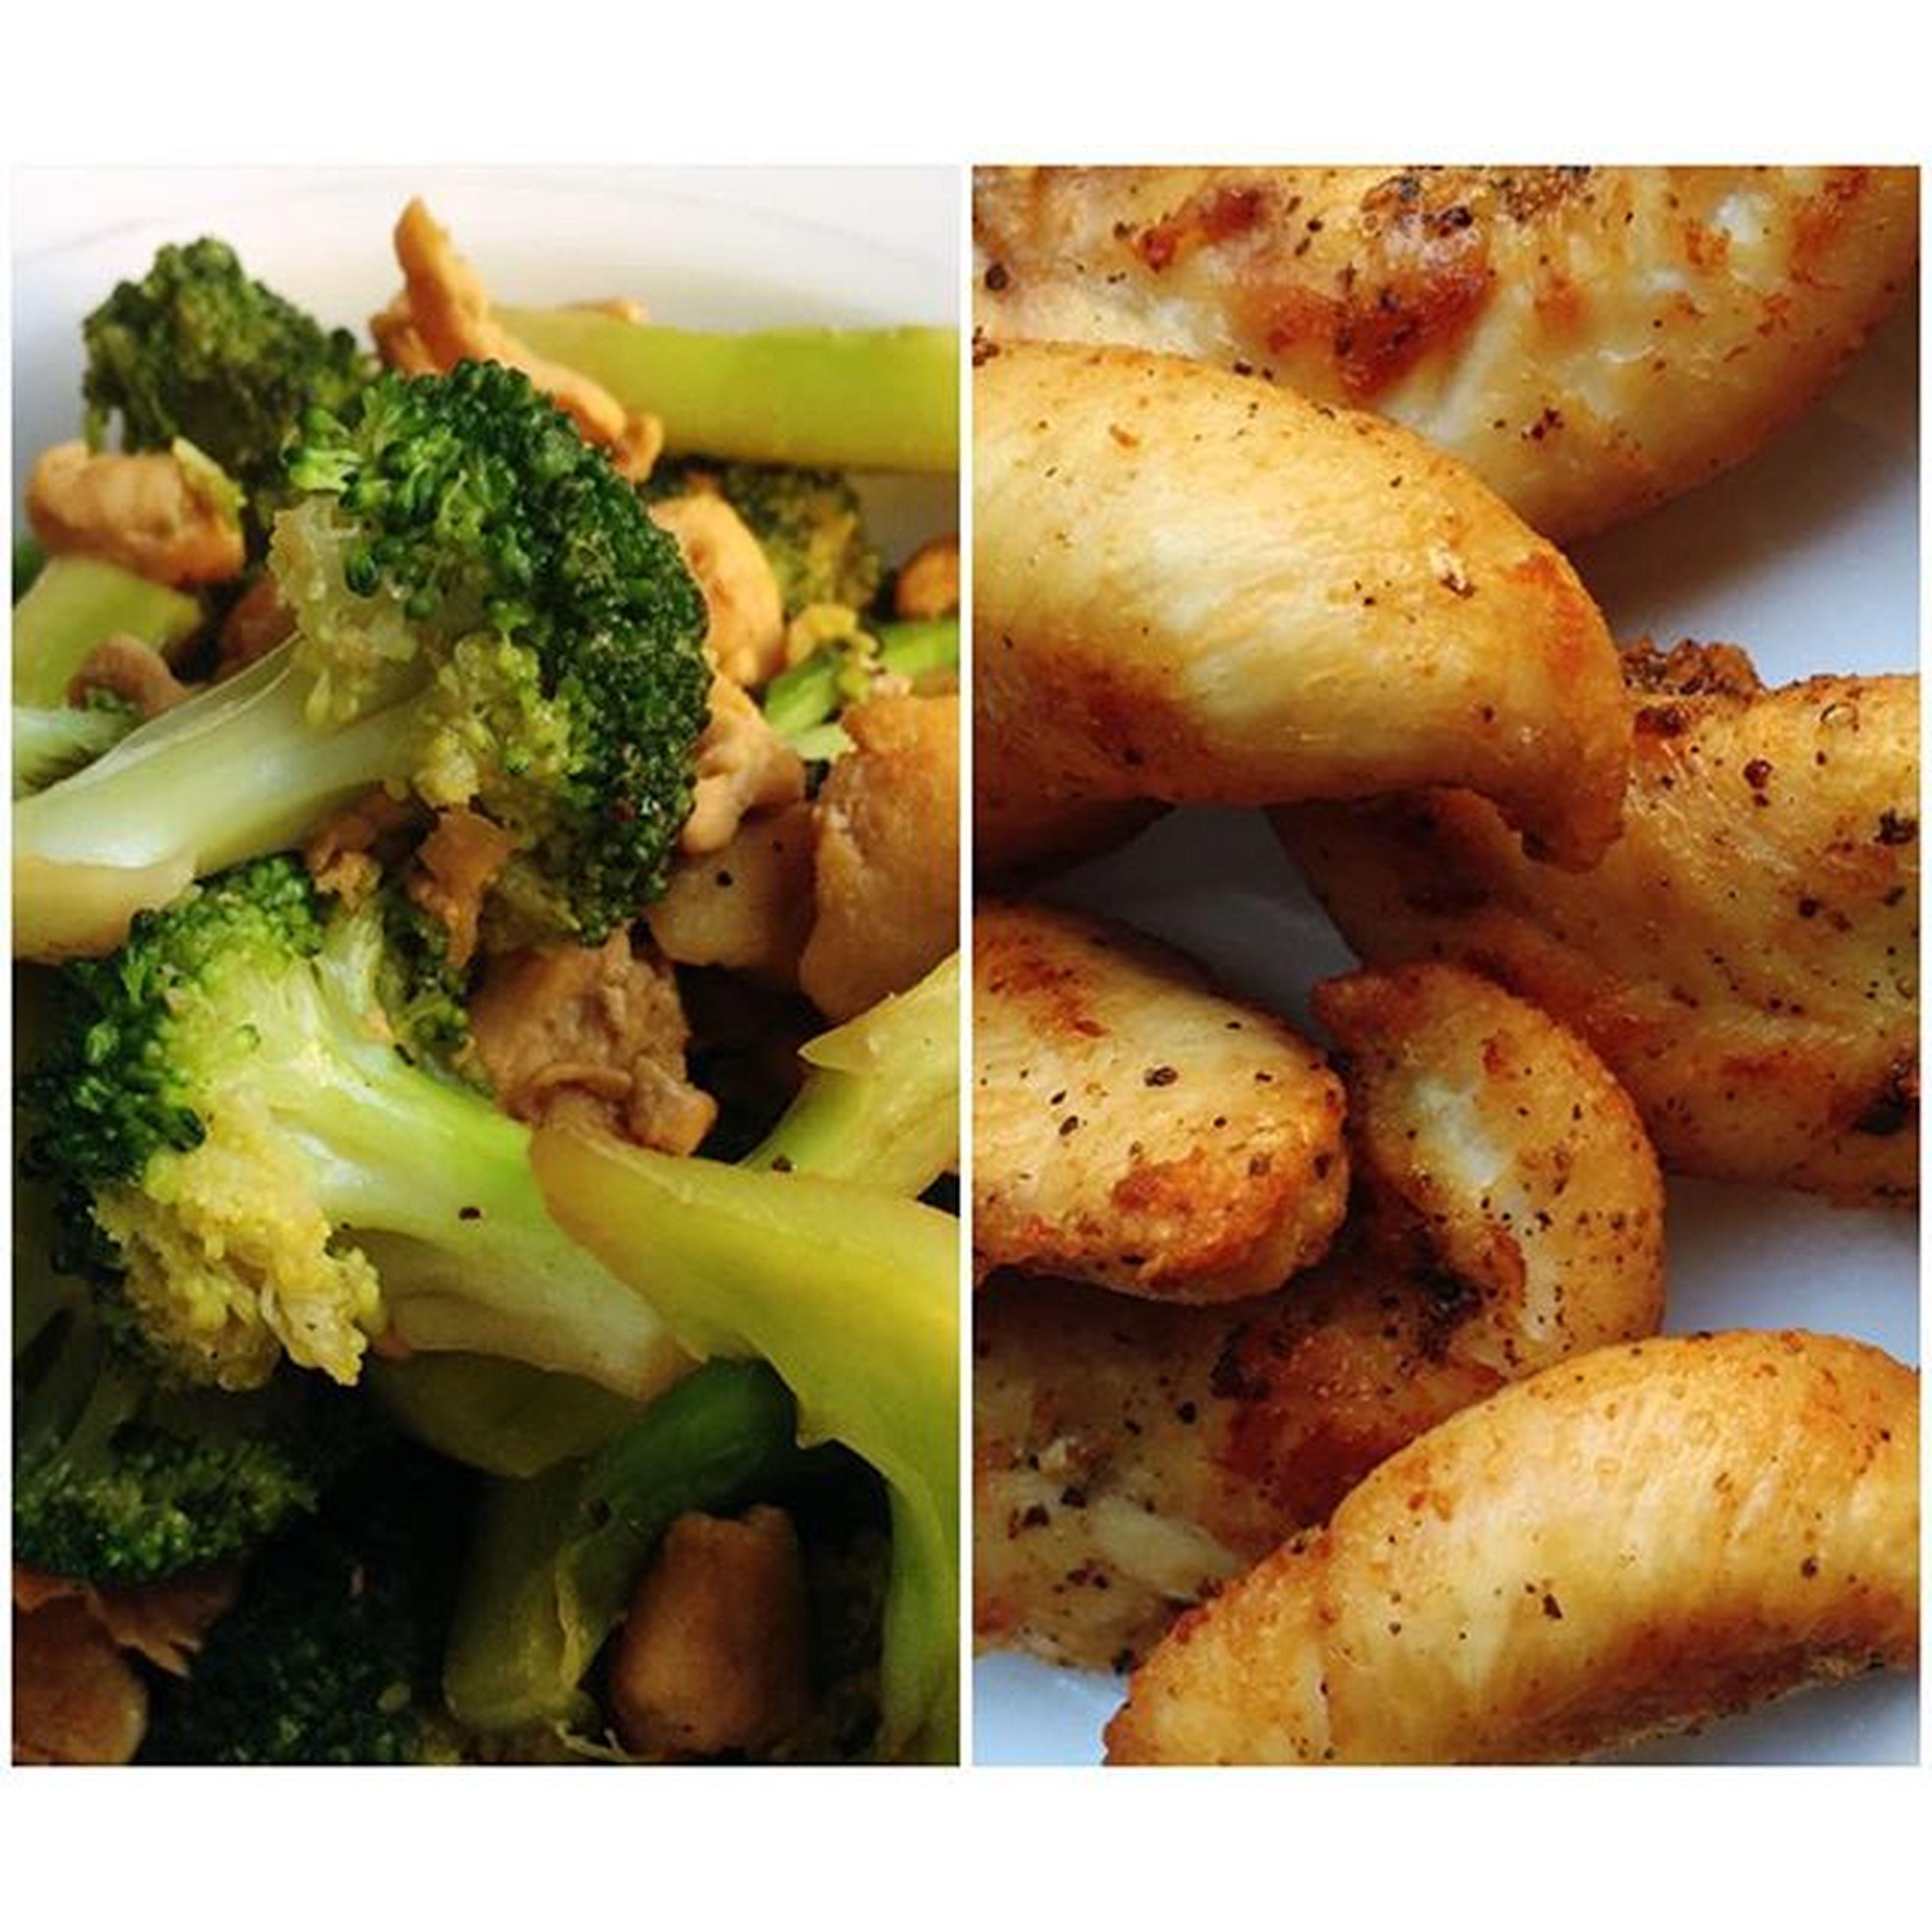 Heavymeal Breakfast Friedchicken Chickenteriyakiwithbroccoli